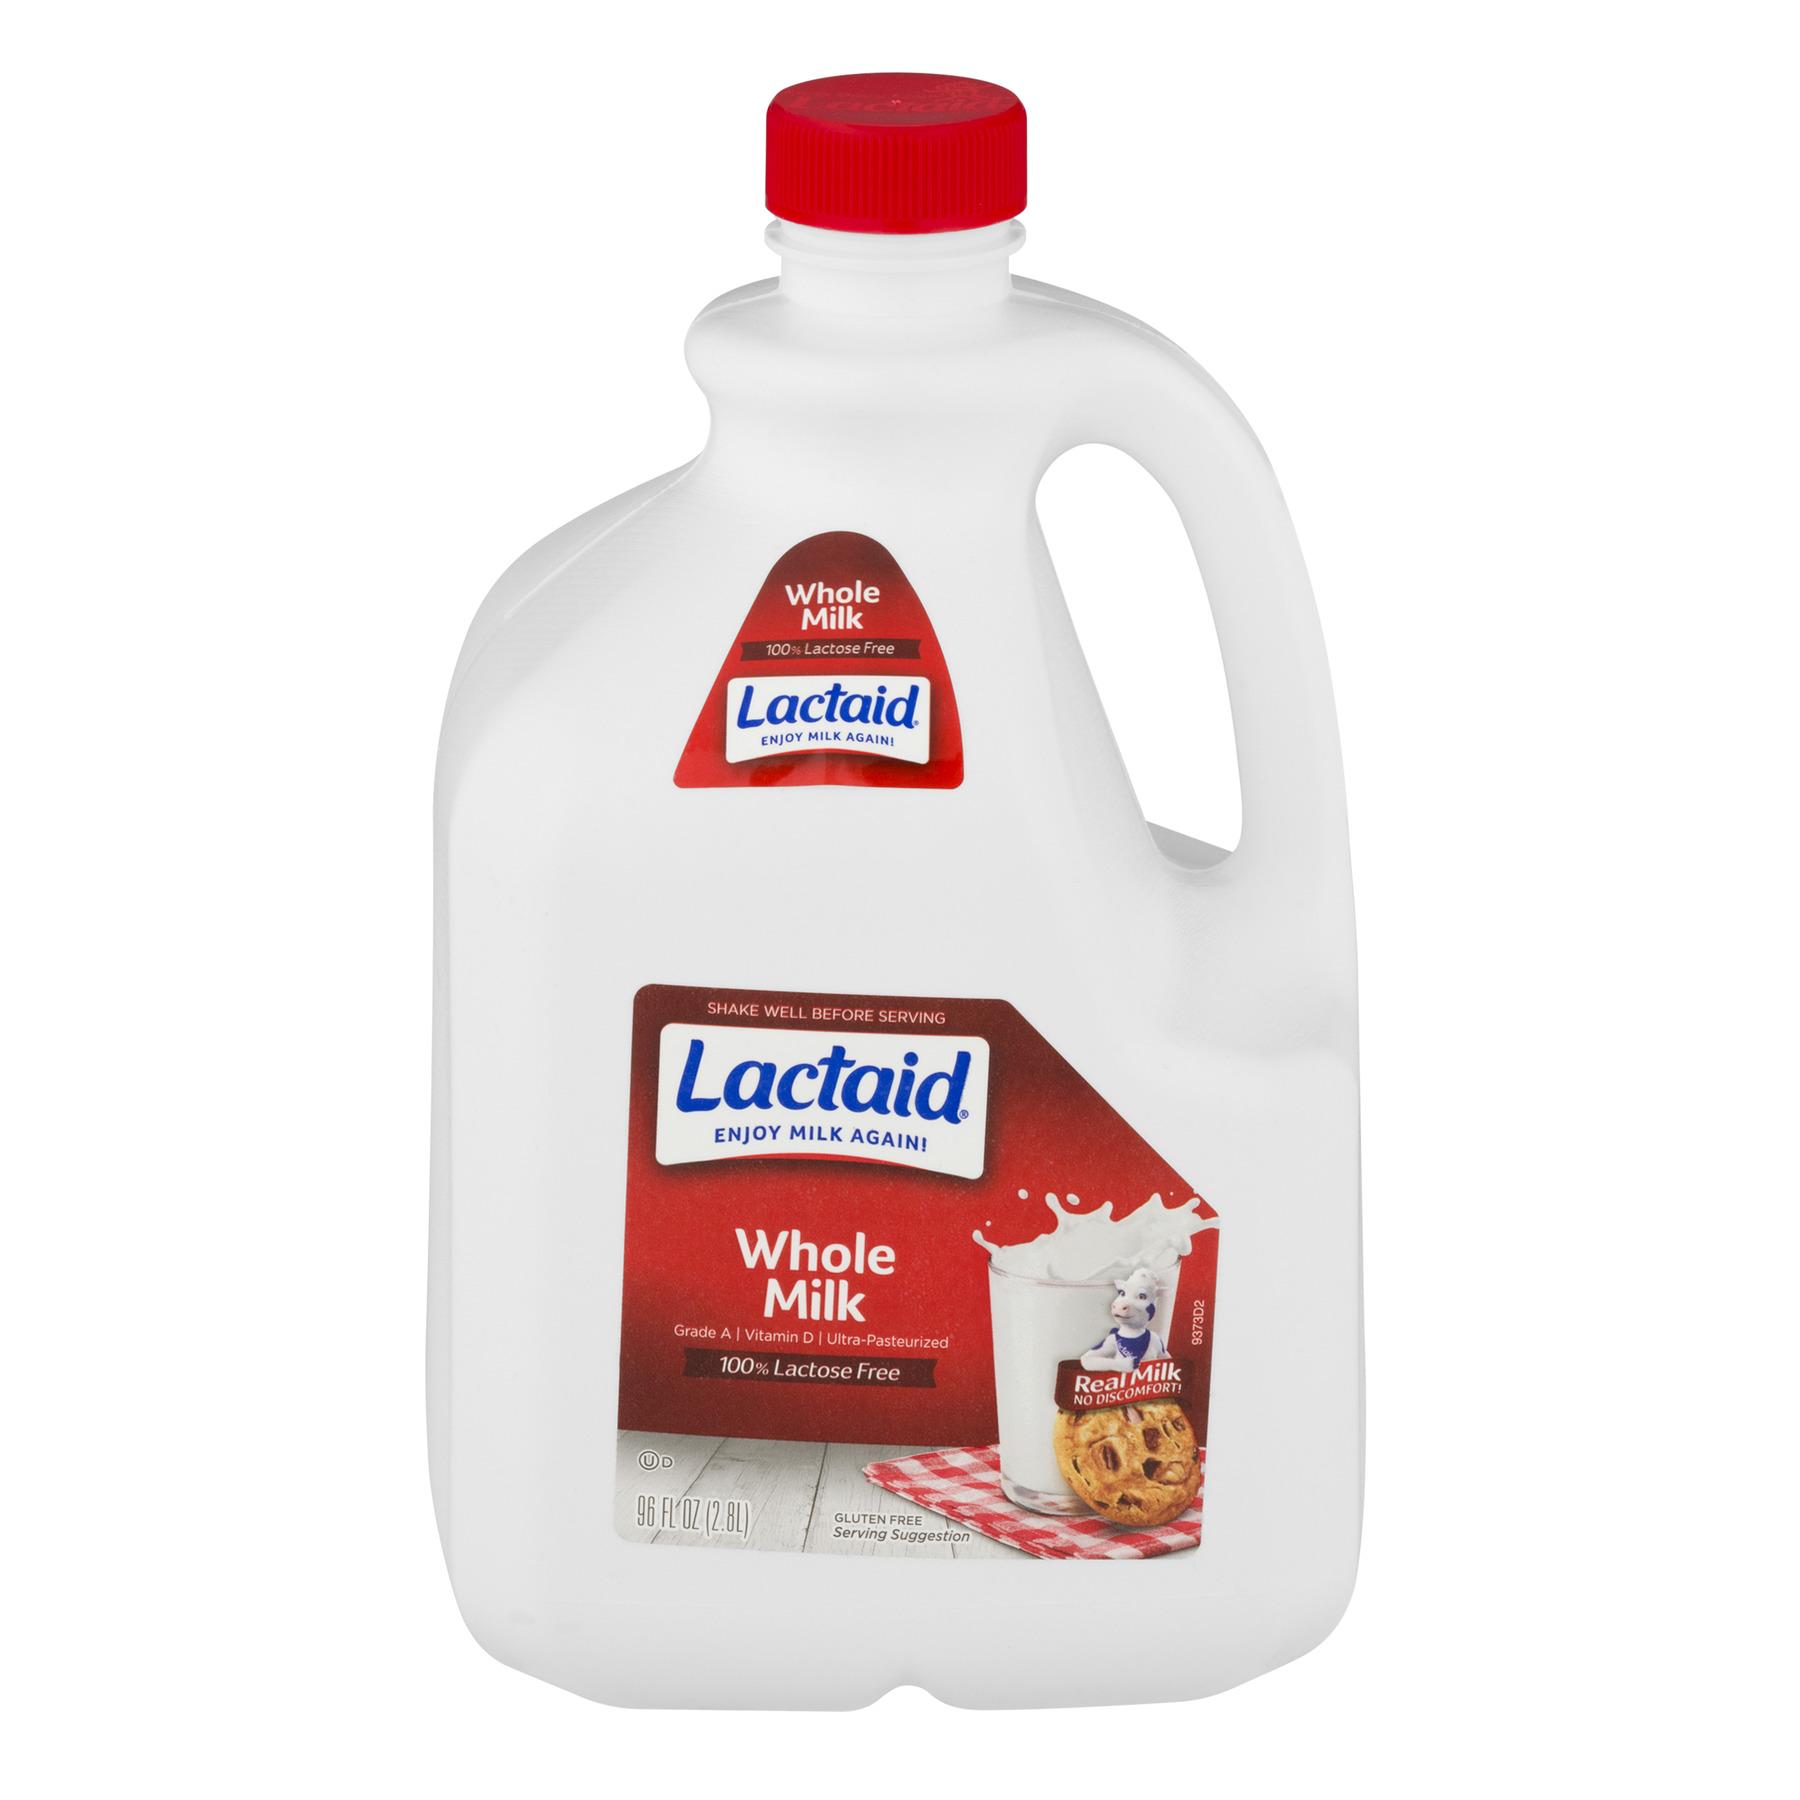 Lactaid 100% Lactose Free Whole Milk, 3 Quarts, 96 Fl. Oz.